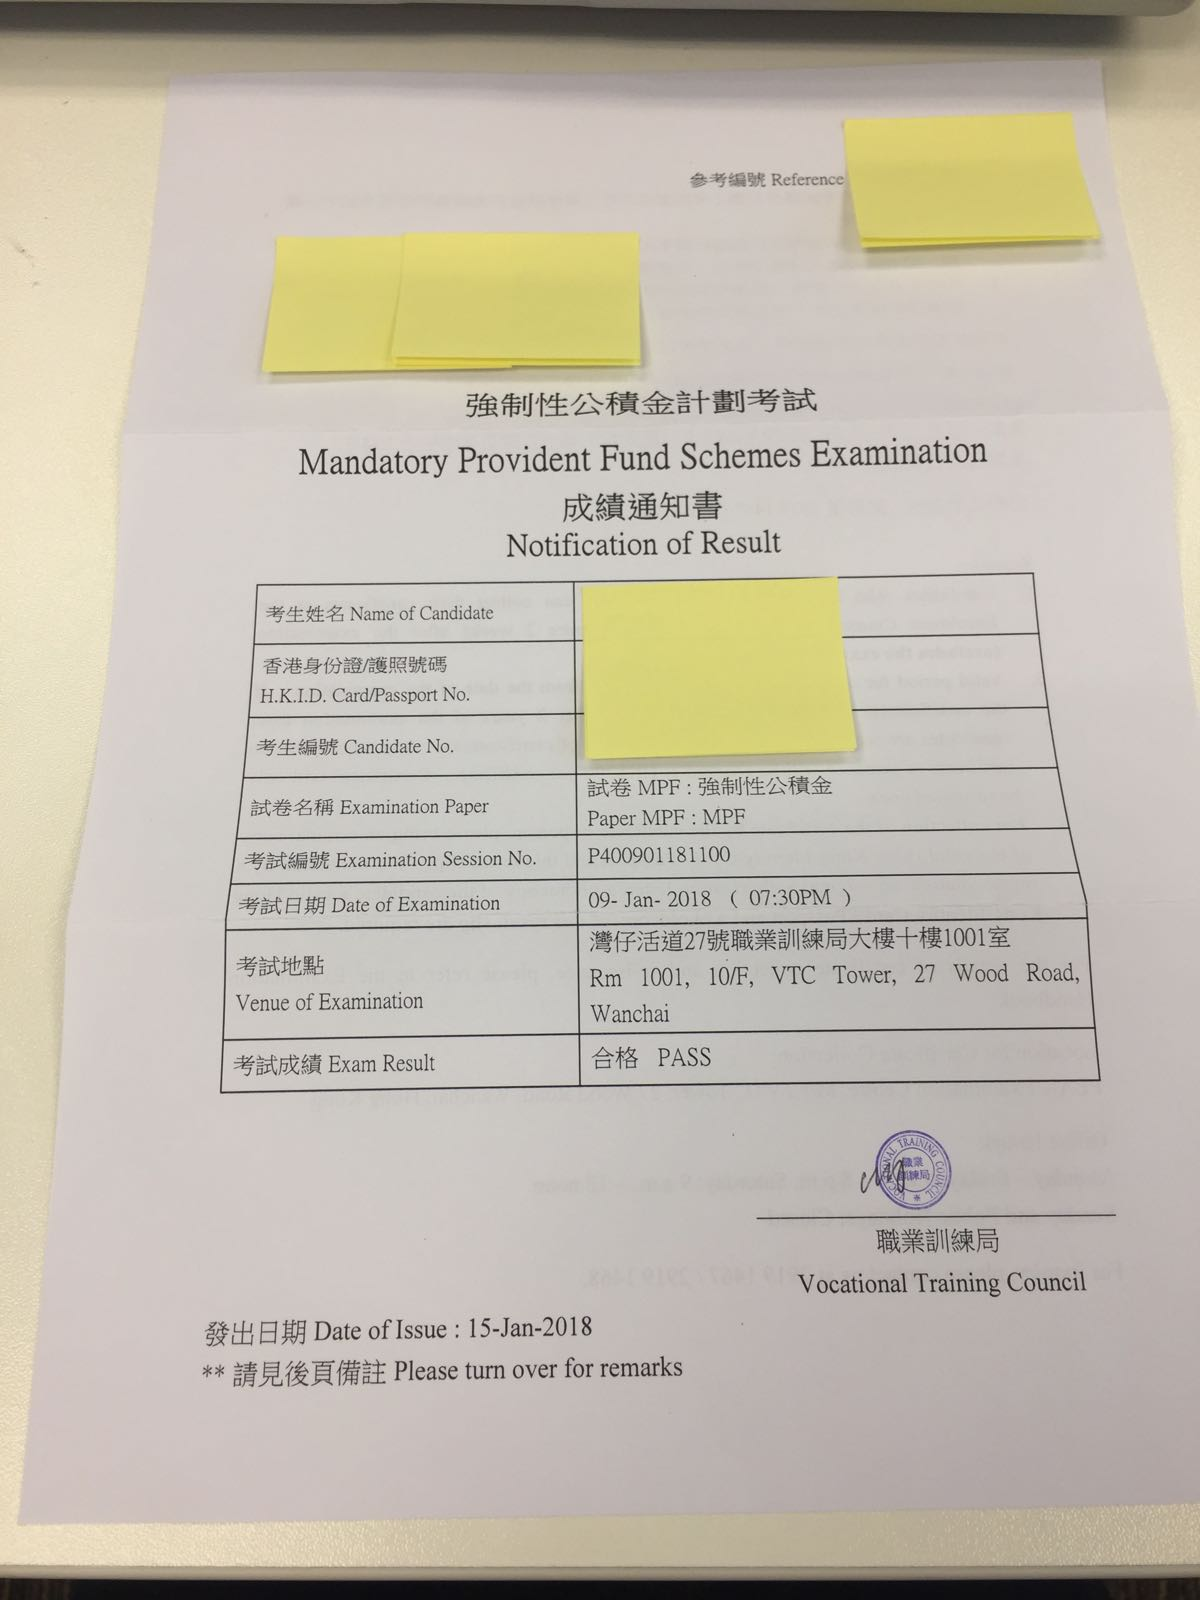 KLW 9/1/2018 MPFE 強積金中介人資格考試 Pass